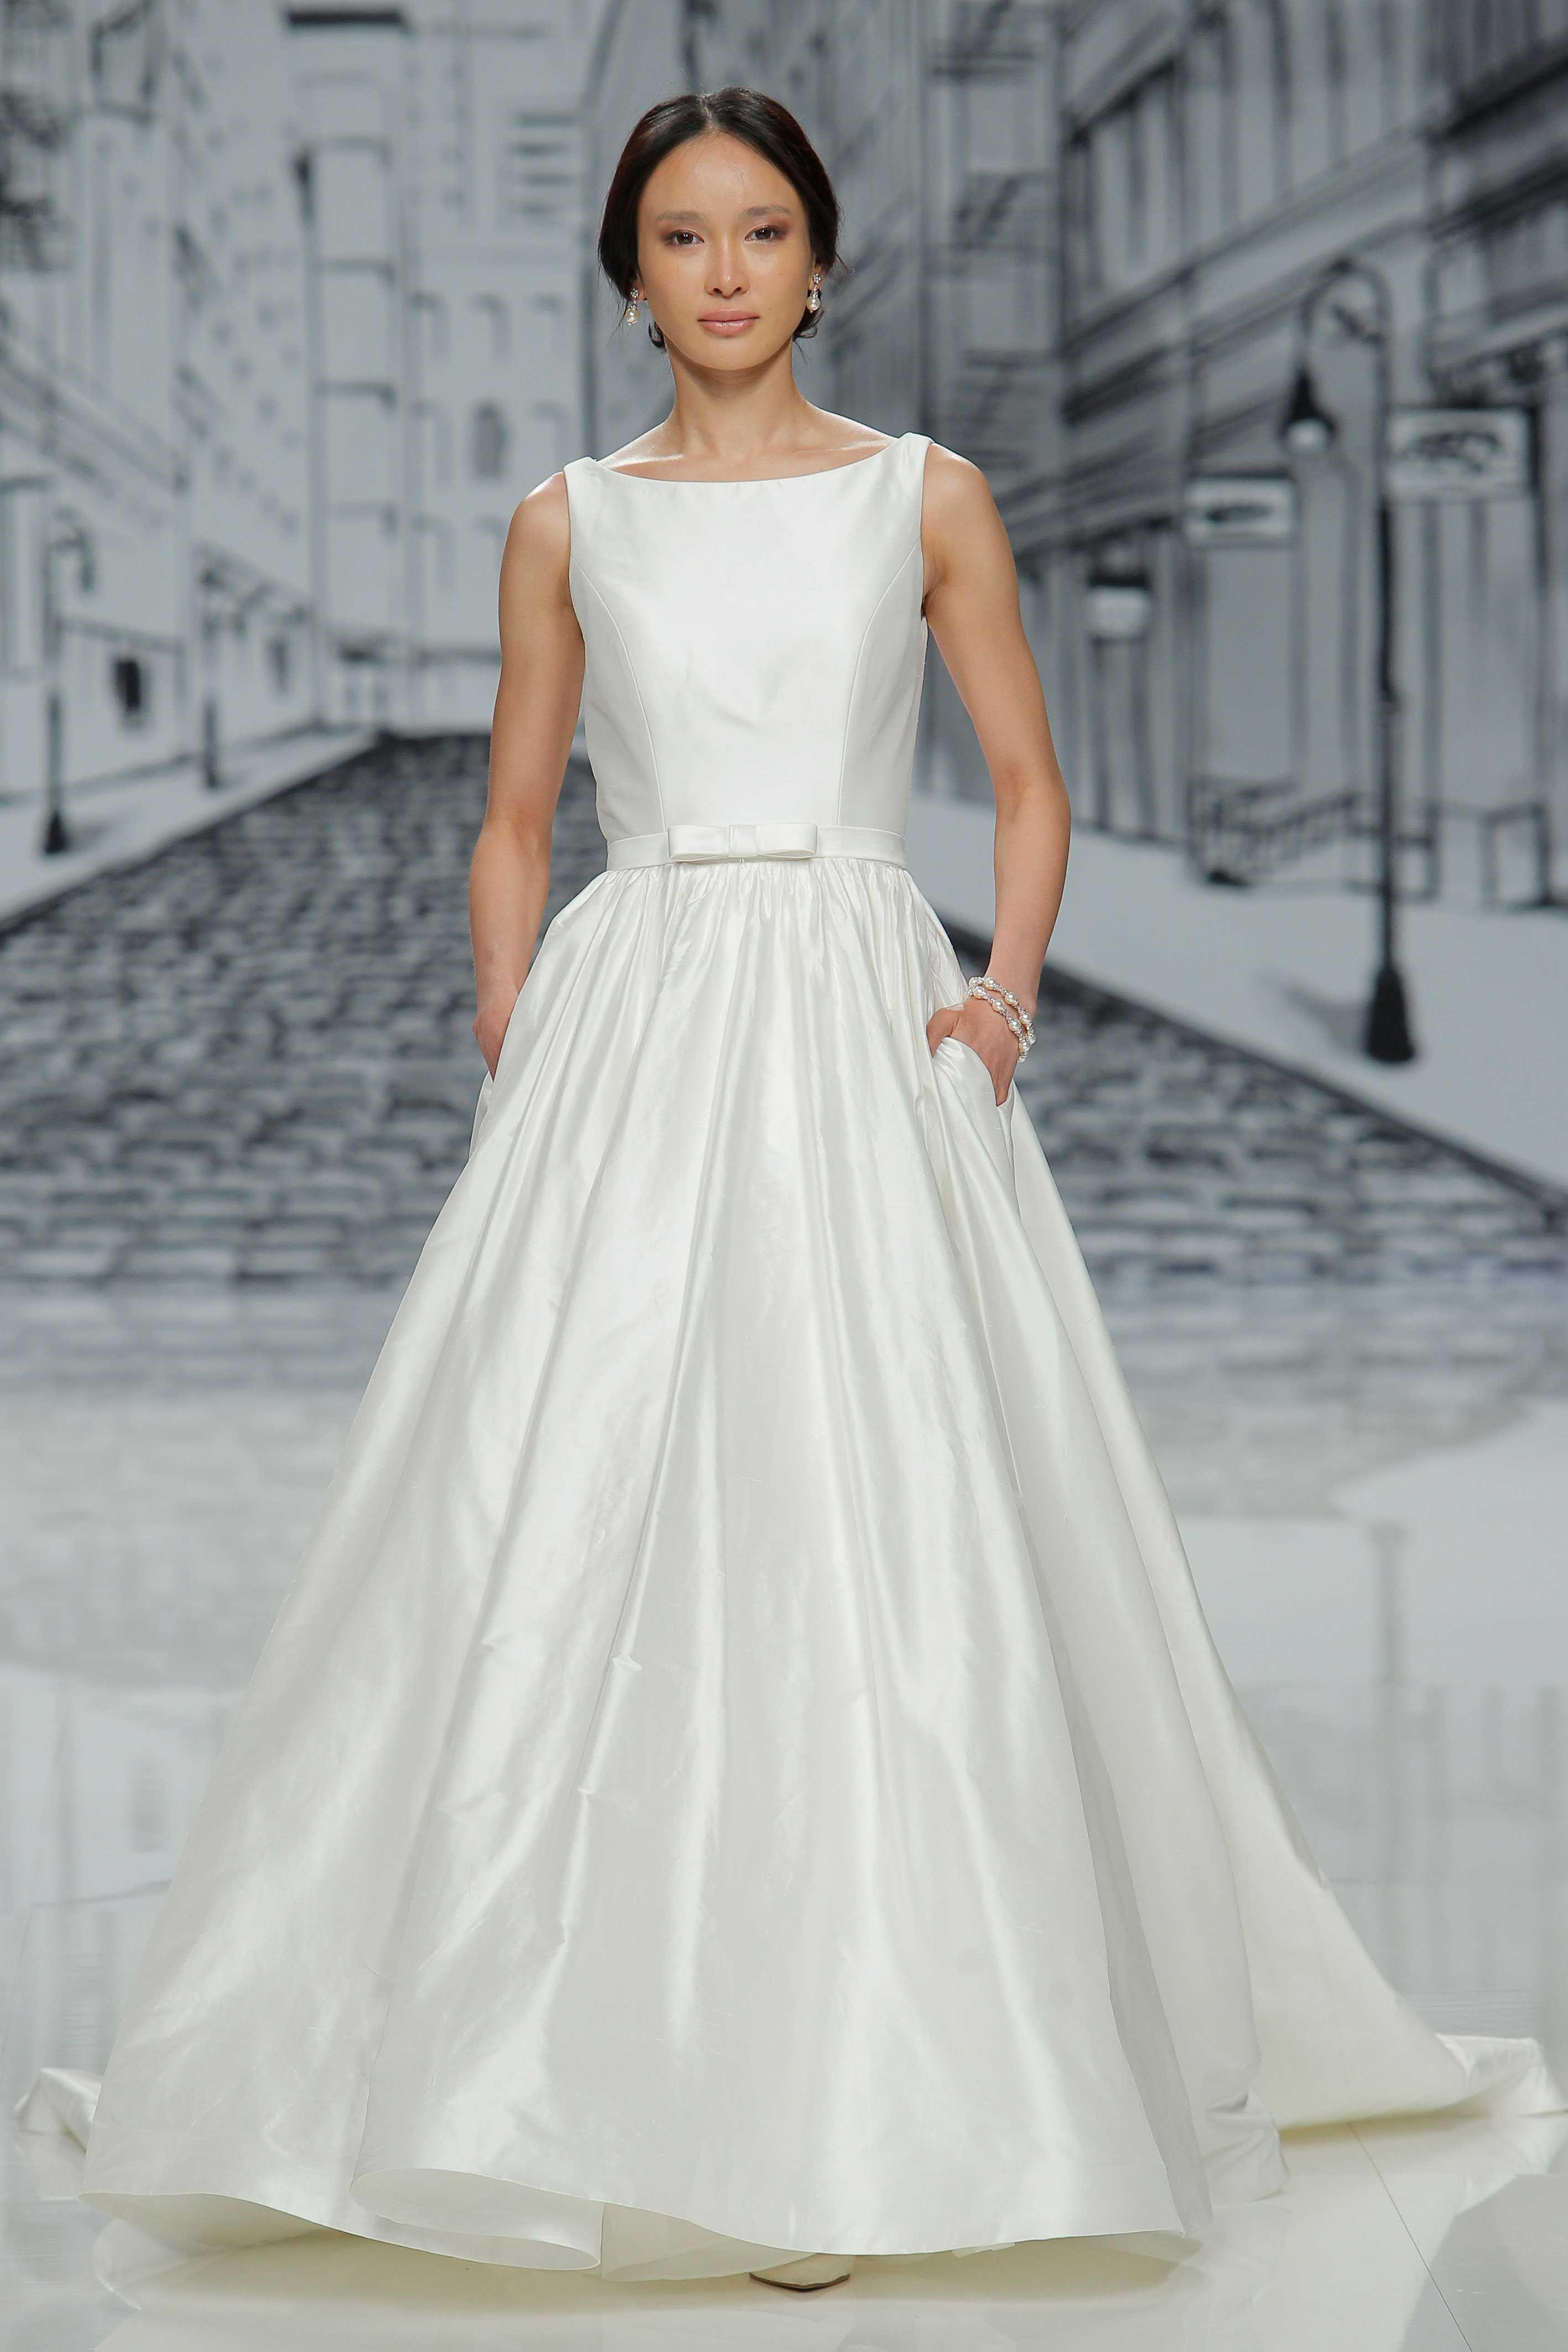 10 Designer Wedding Gowns In Simple Styles Vegas Wedding Dress Wedding Dresses Simple Wedding Gowns